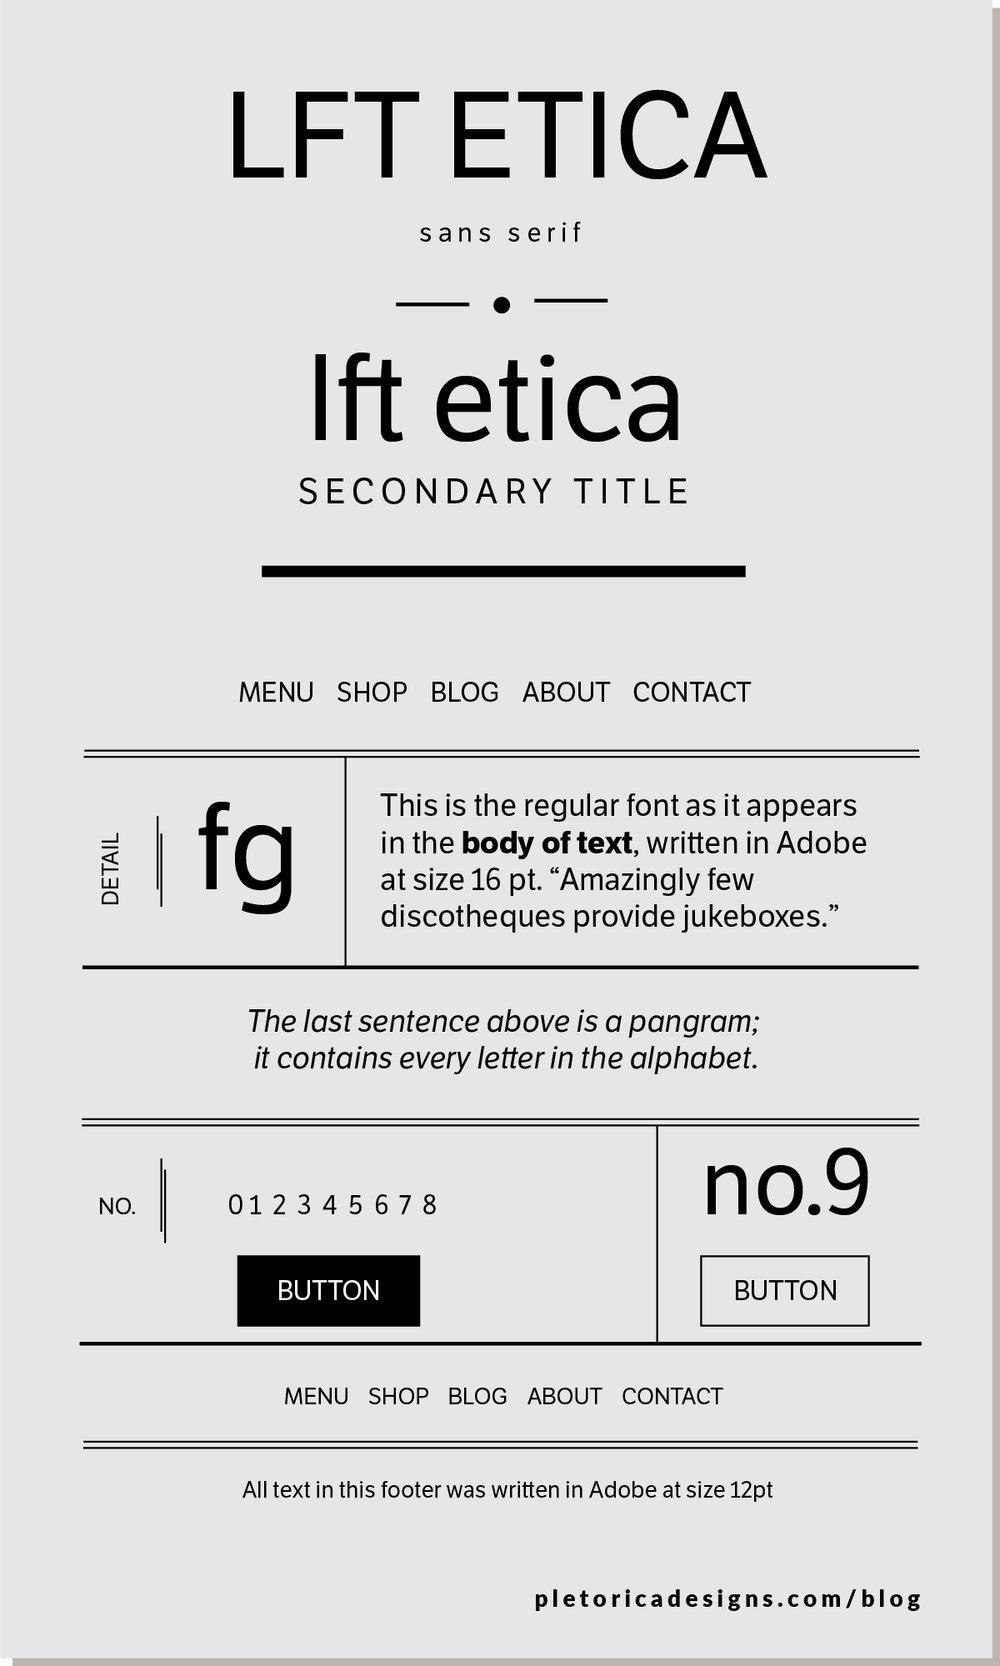 LET'S TYPE: LFT Etica — PLETÓRICA DESIGNS